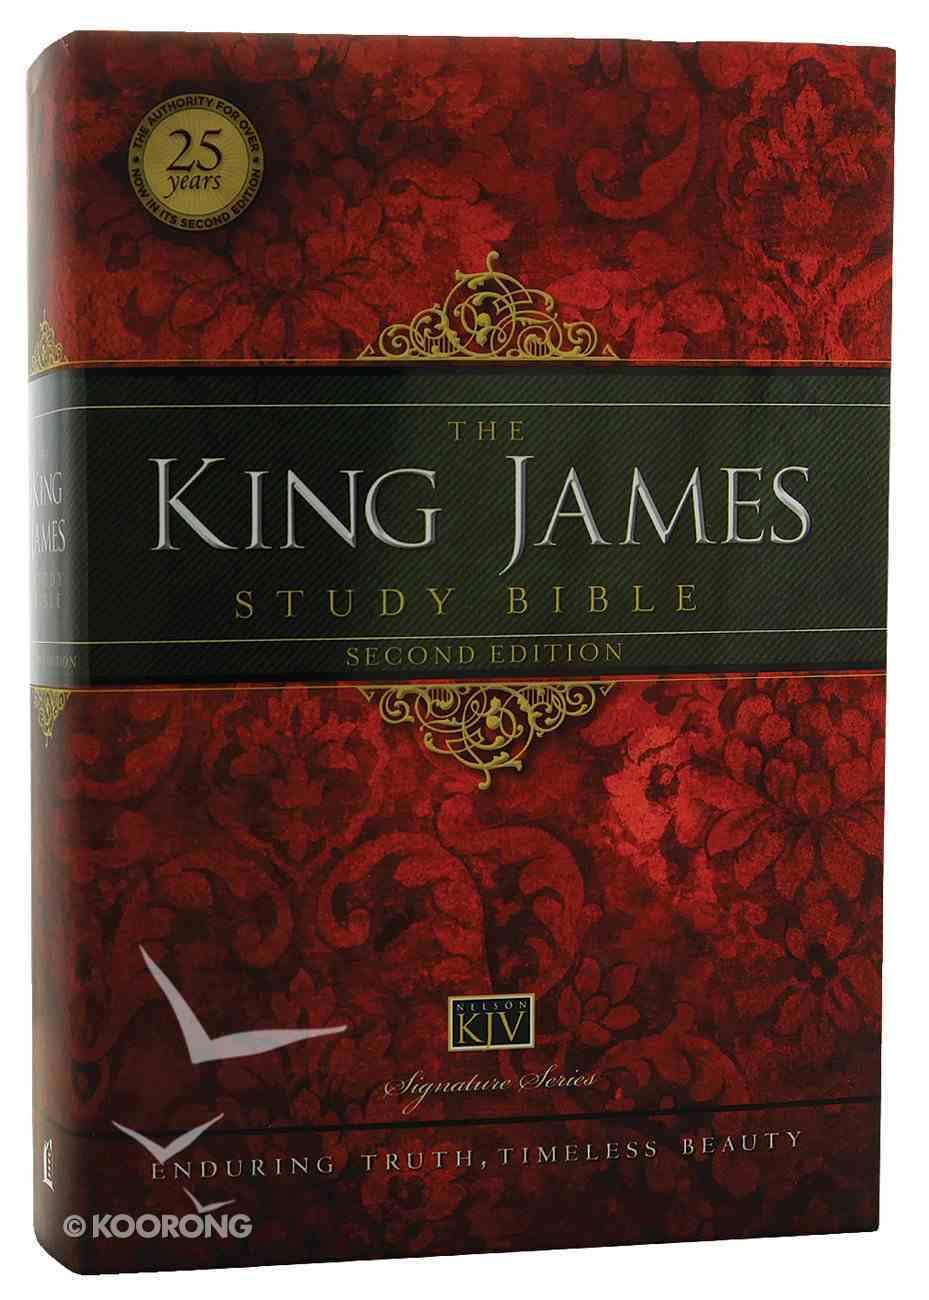 KJV Study Bible (Second Edition) Hardback